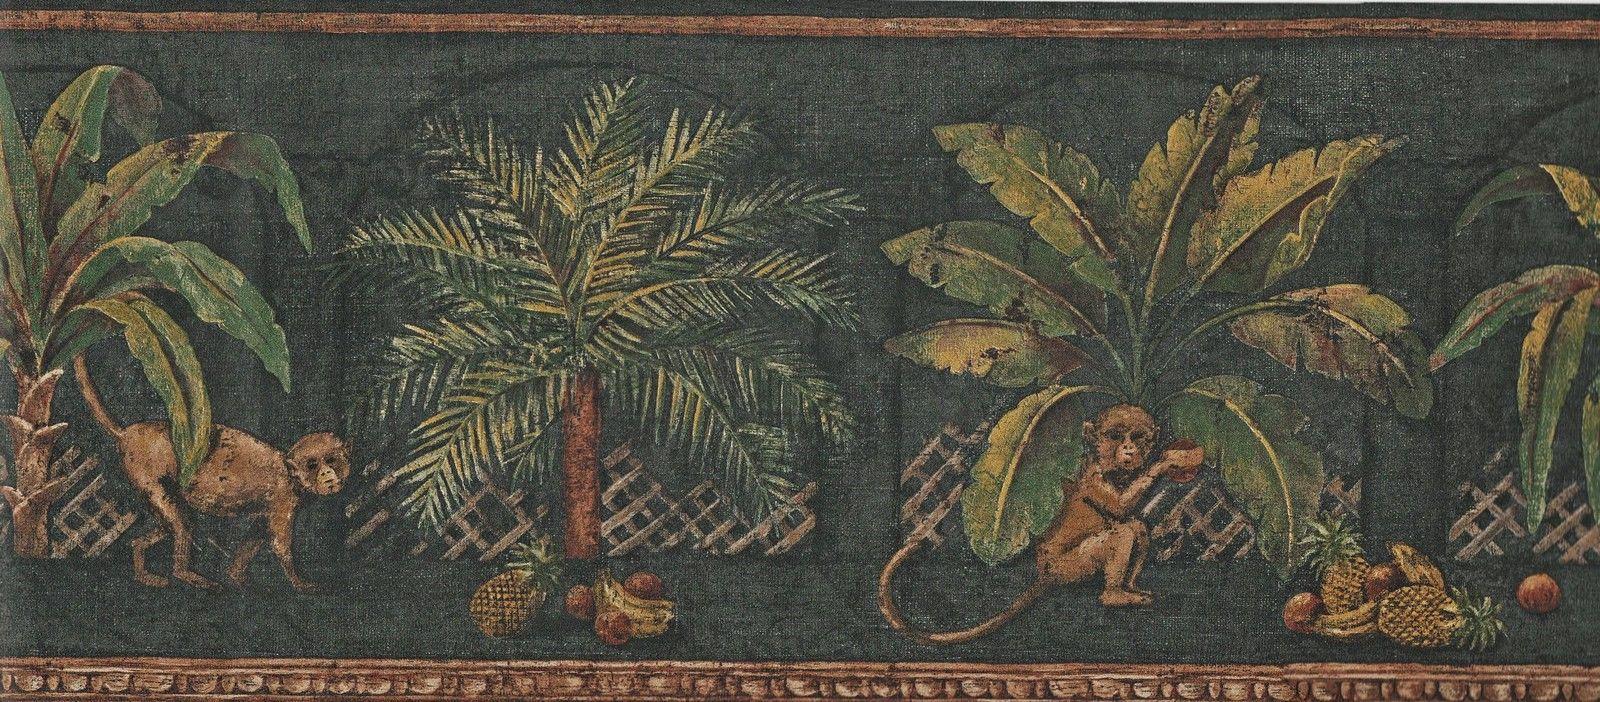 Sale Tropical Palm Tree Leaves Black Background Wallpaper Border 1600x702